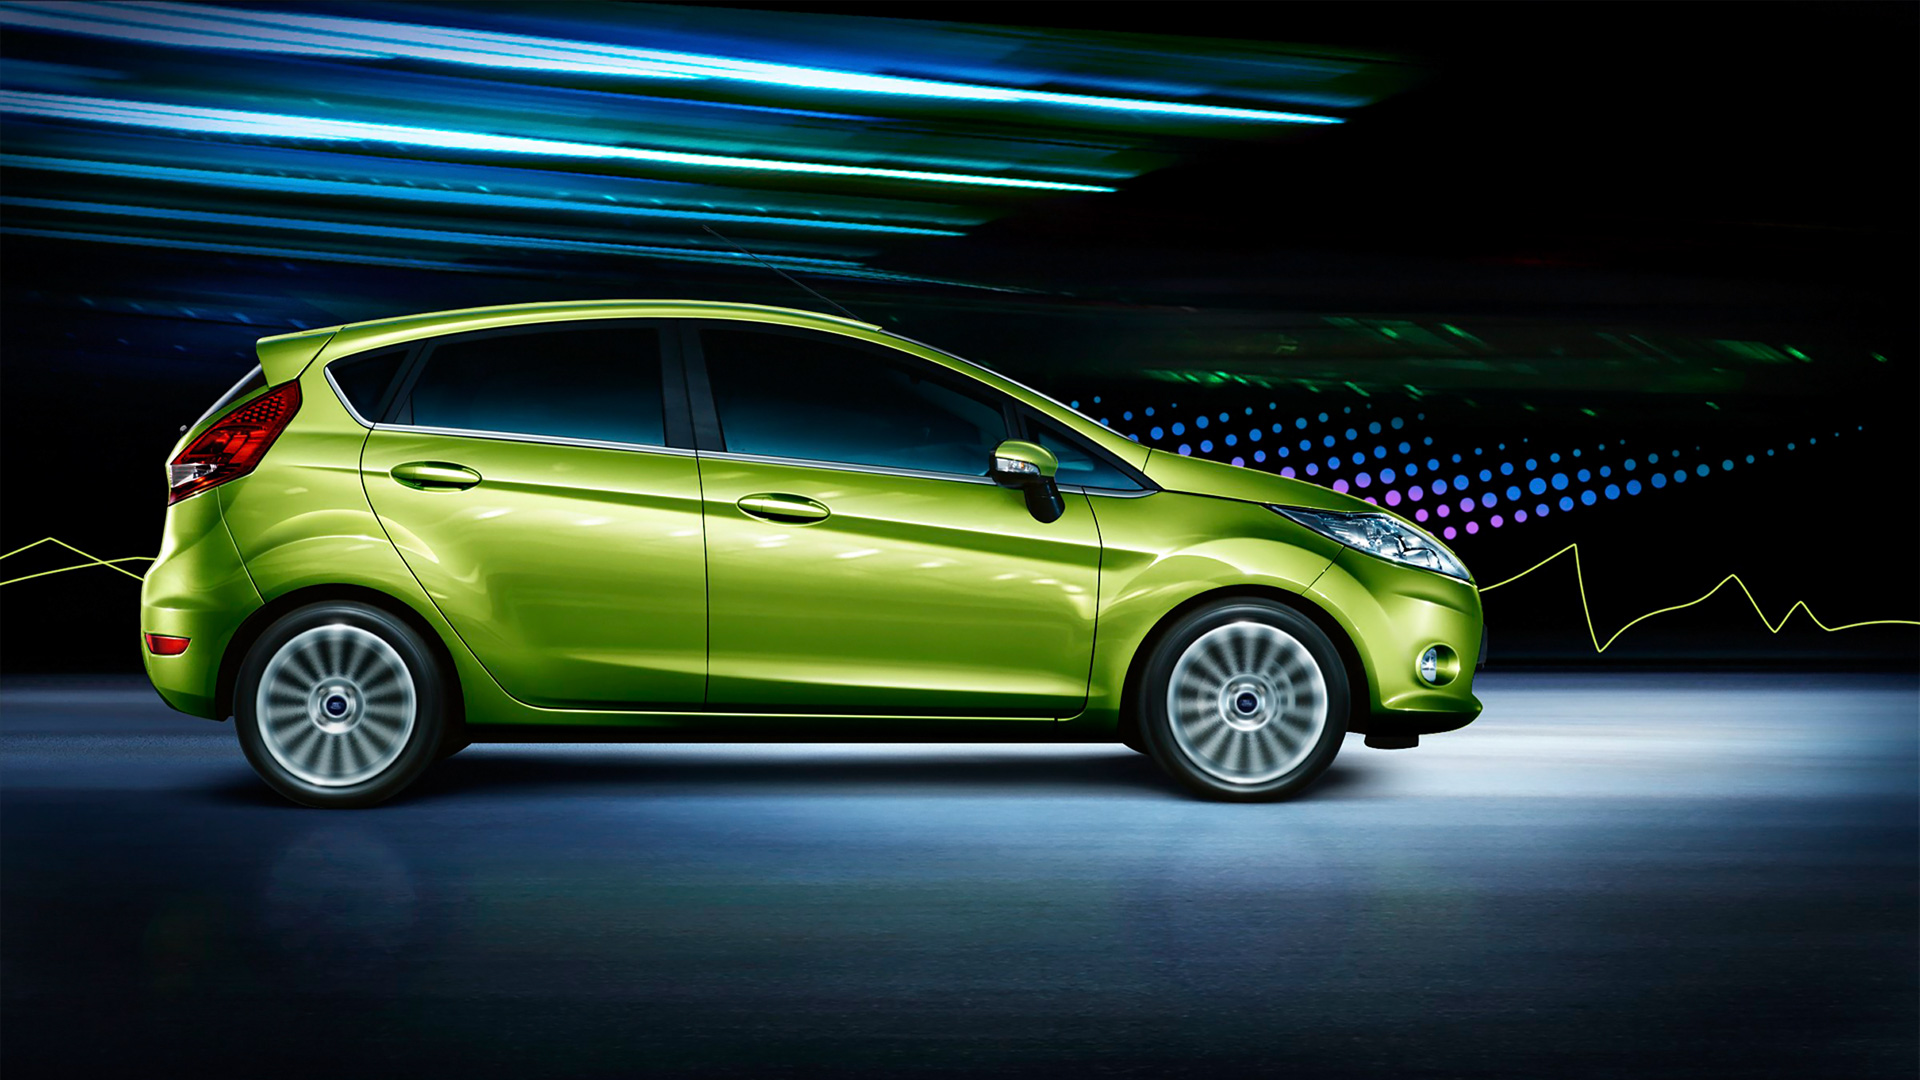 Ford Fiesta Wallpaper